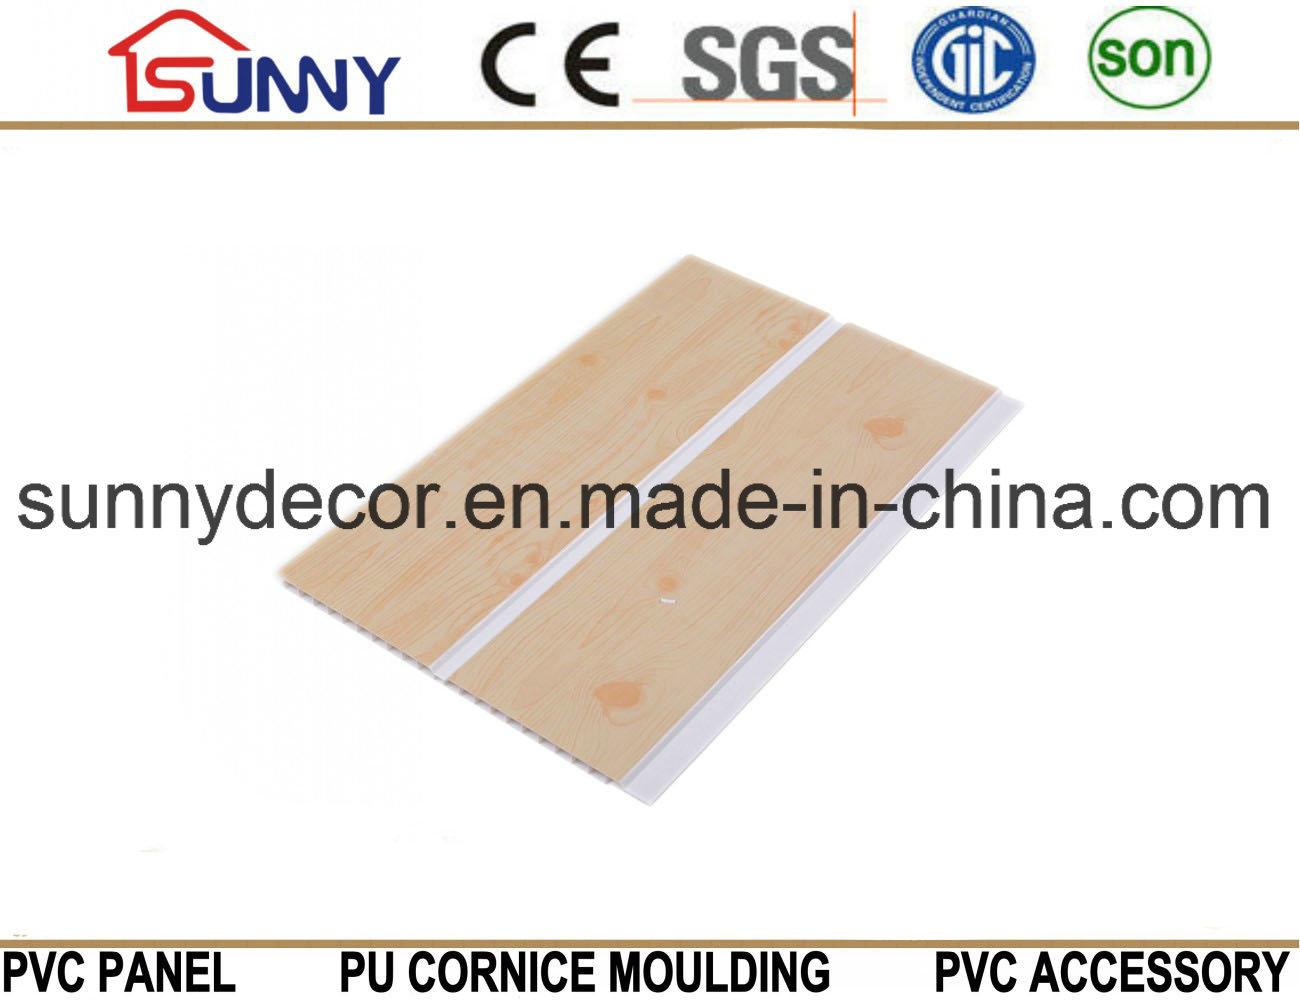 Wooden Design PVC Ceiling Panel PVC Wall Panel Plastic Panel Cielo Raso De PVC